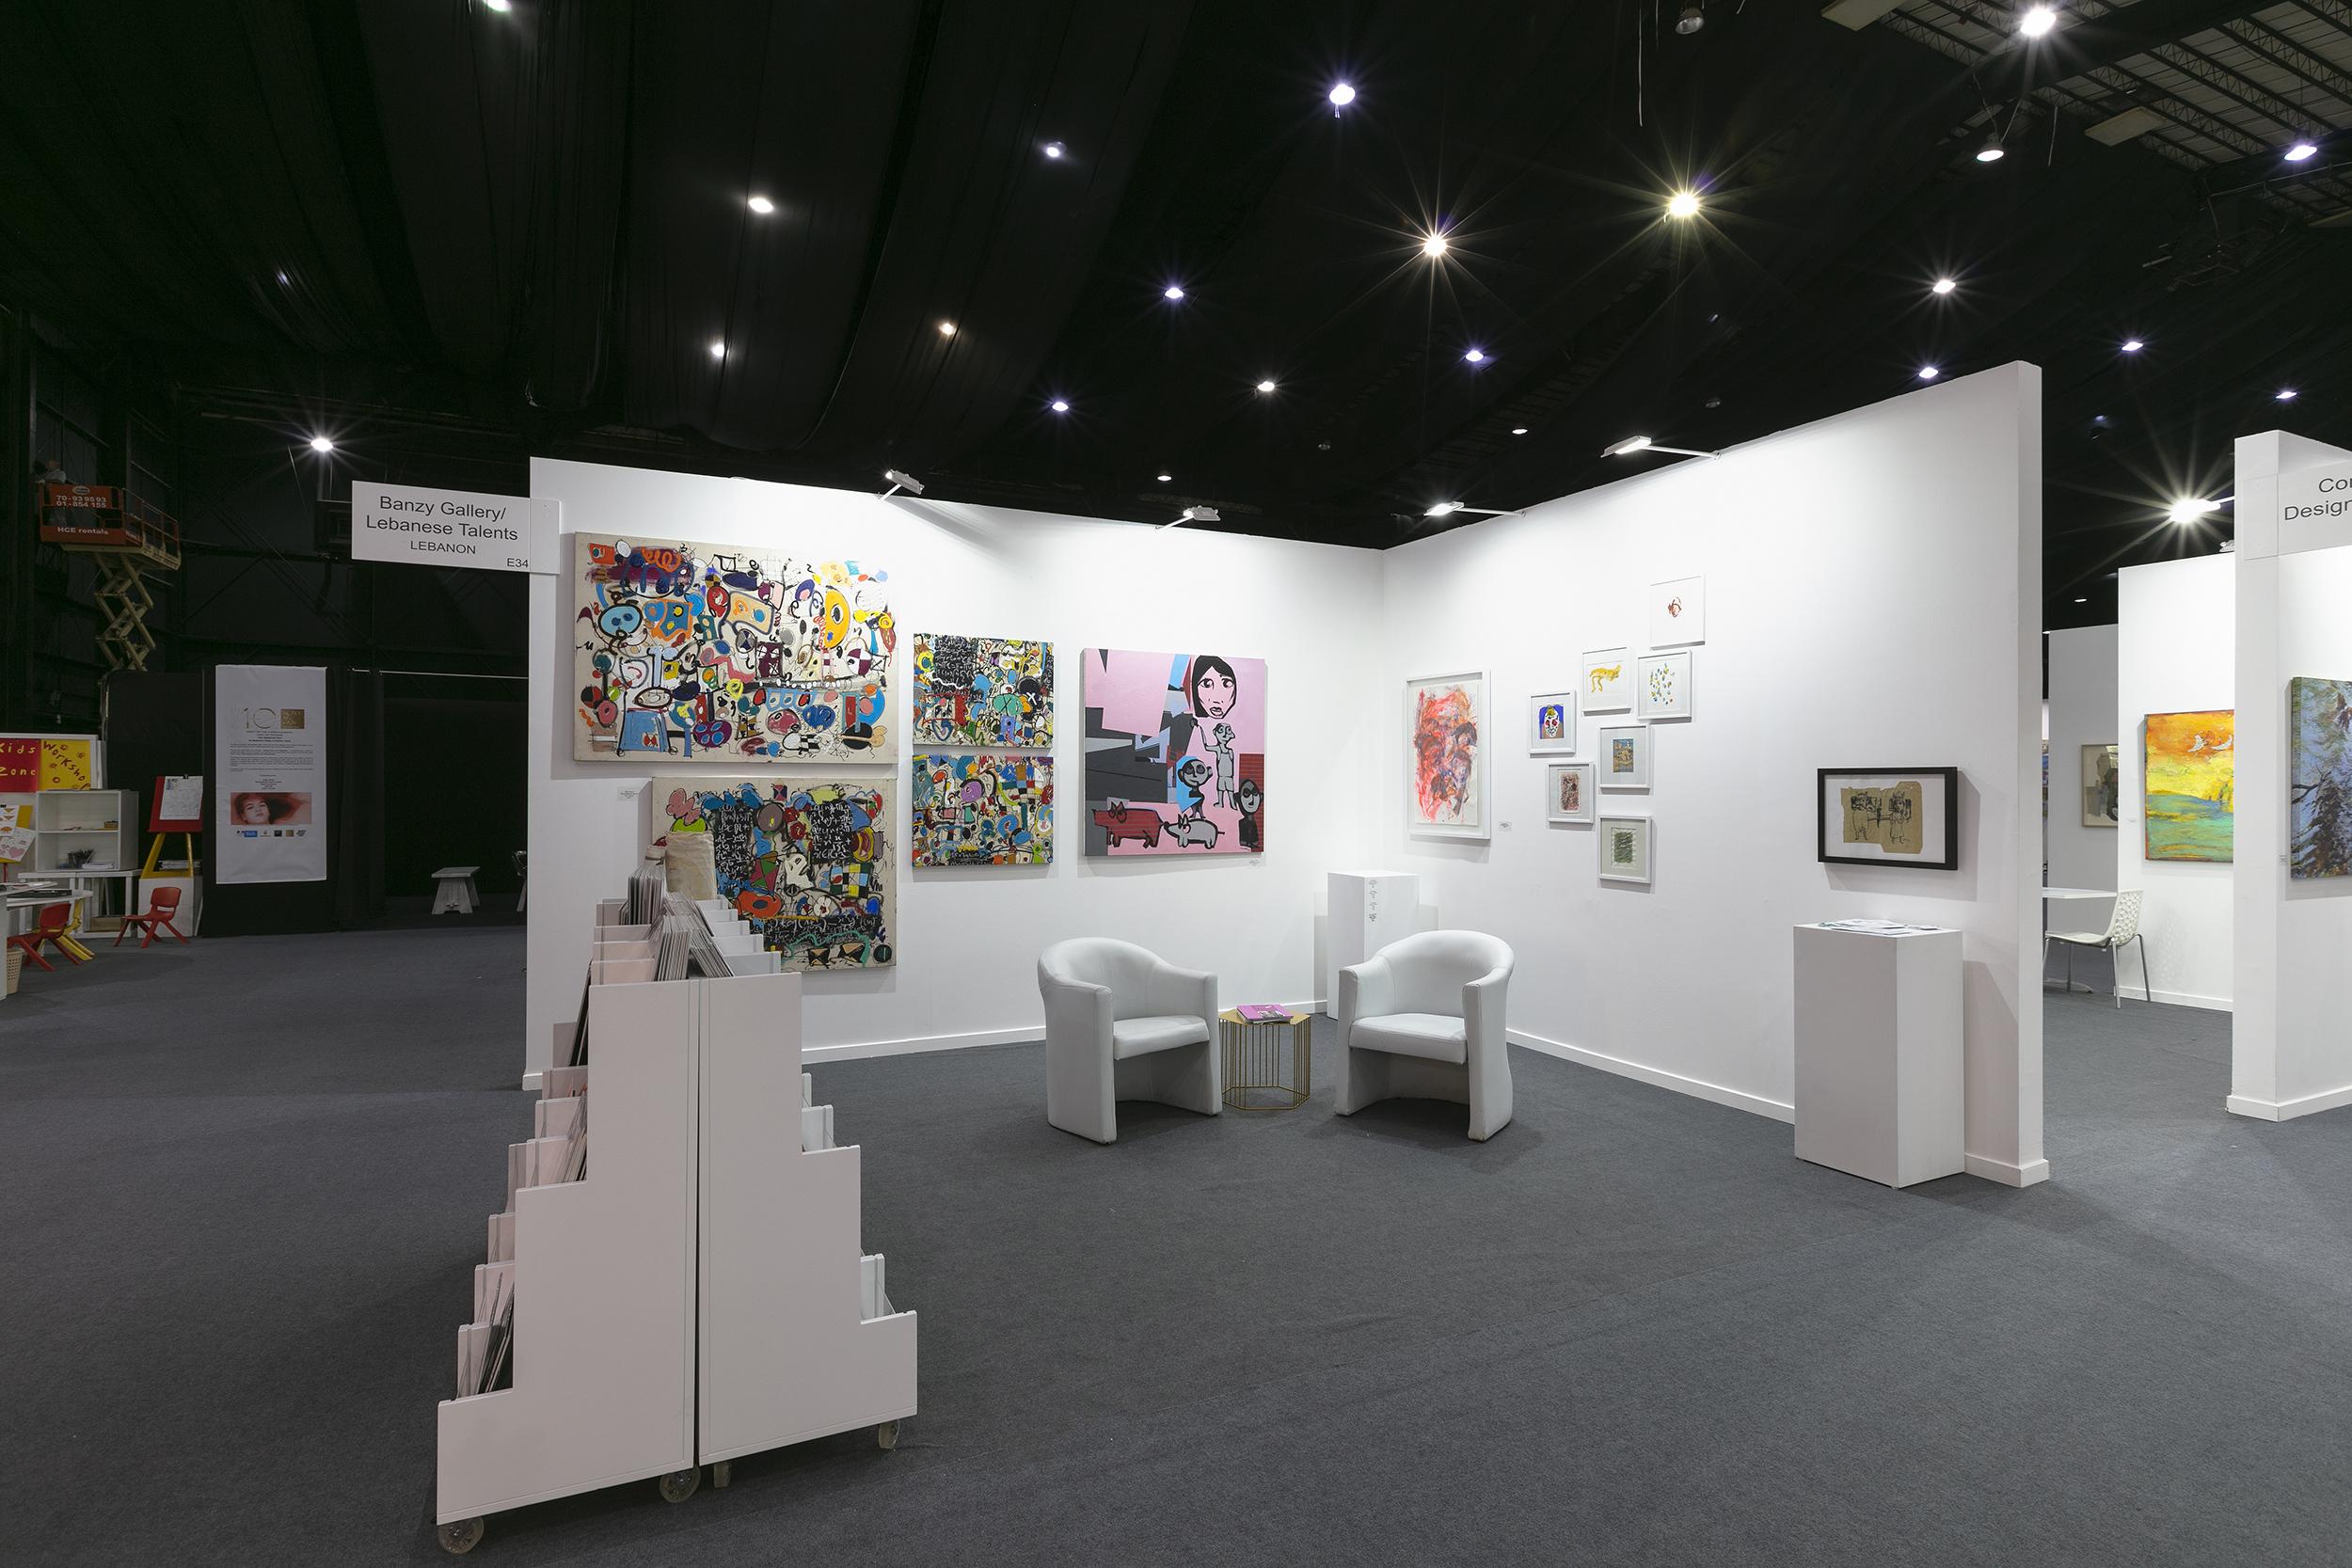 Banzy Gallery & Lebanese Talents